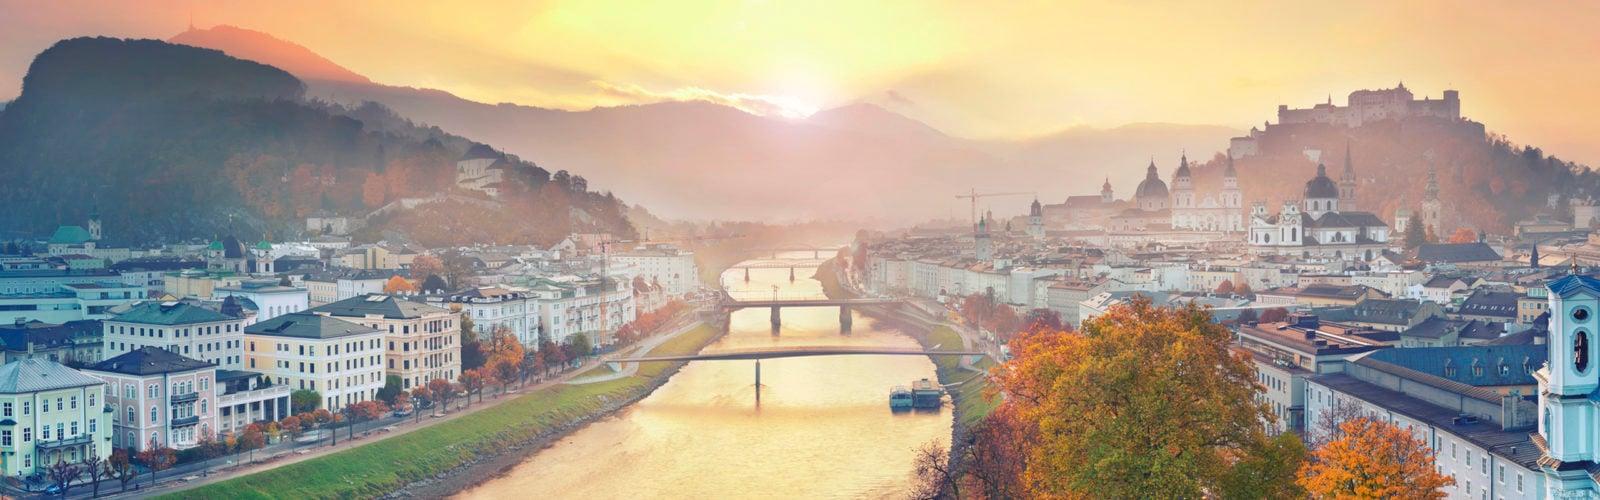 salzburg-austria-autumn-sunrise